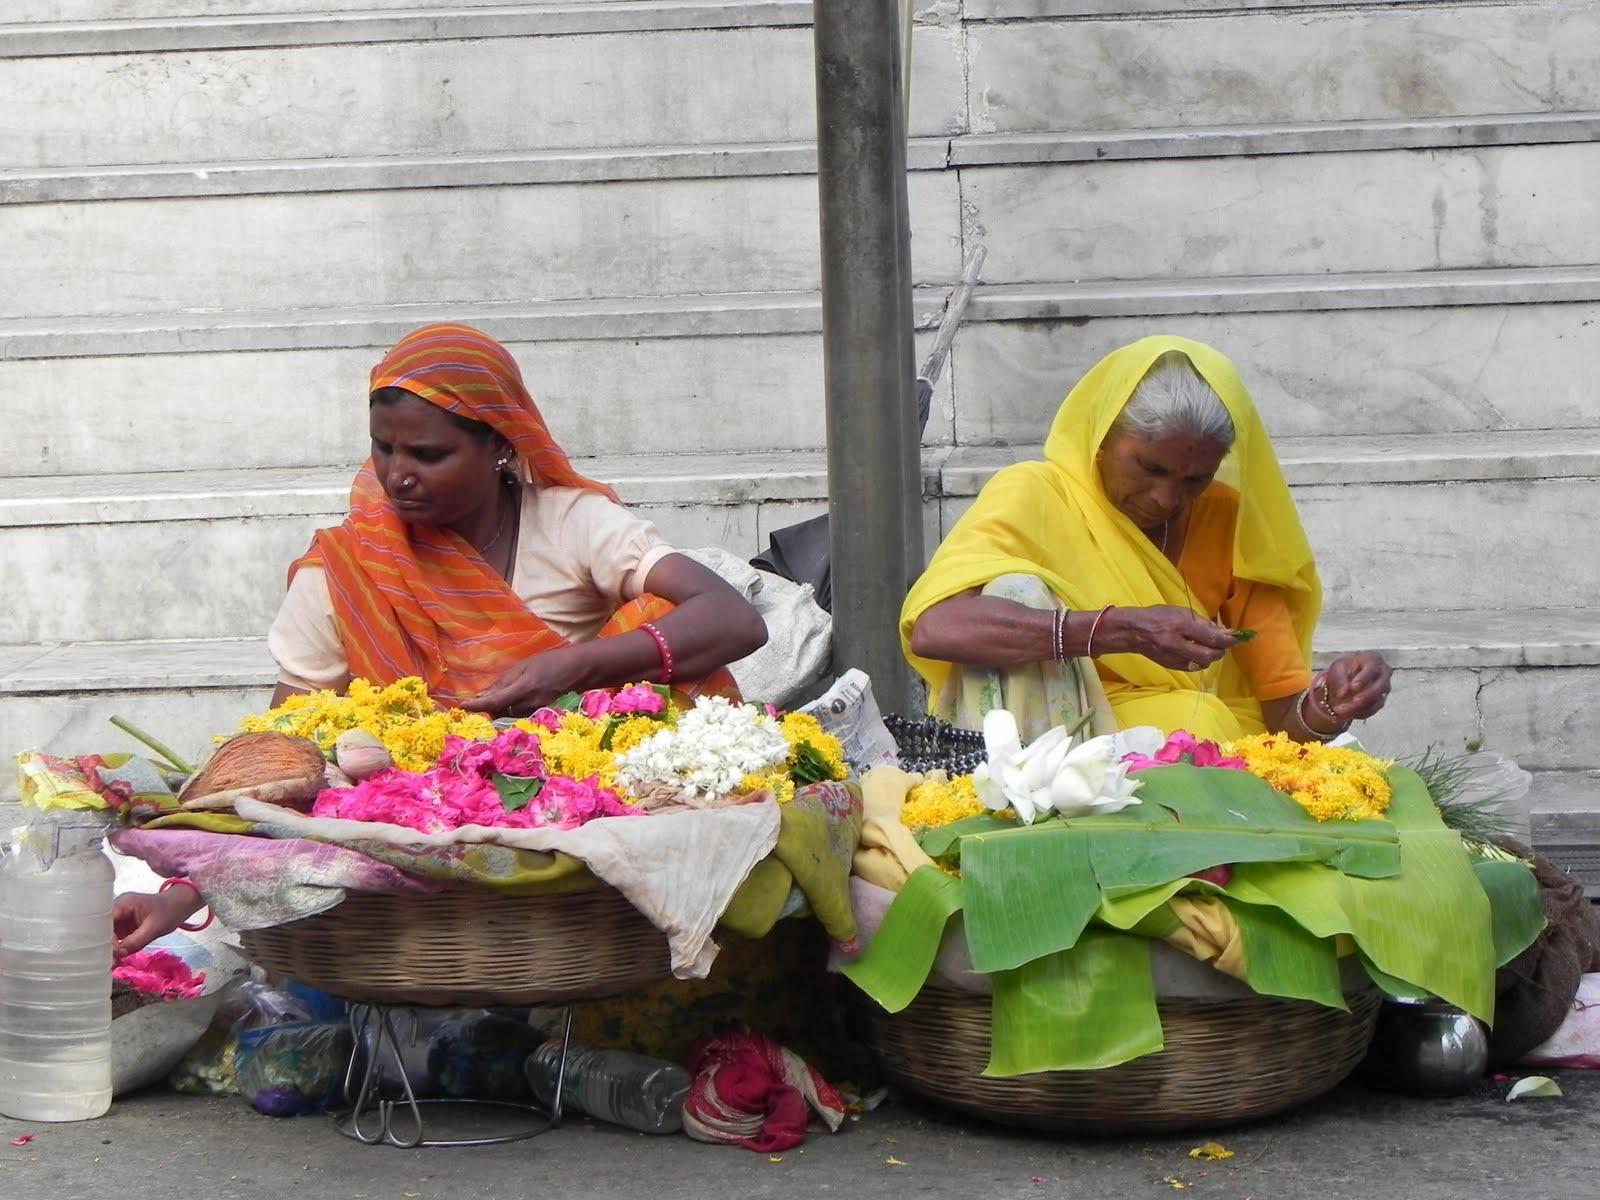 rose city hindu single women In 2005, 695 percent of all births to non-hispanic black women, 633 percent of births of american indian or alaskan native woman, and 479 percent of births to hispanic women occurred.